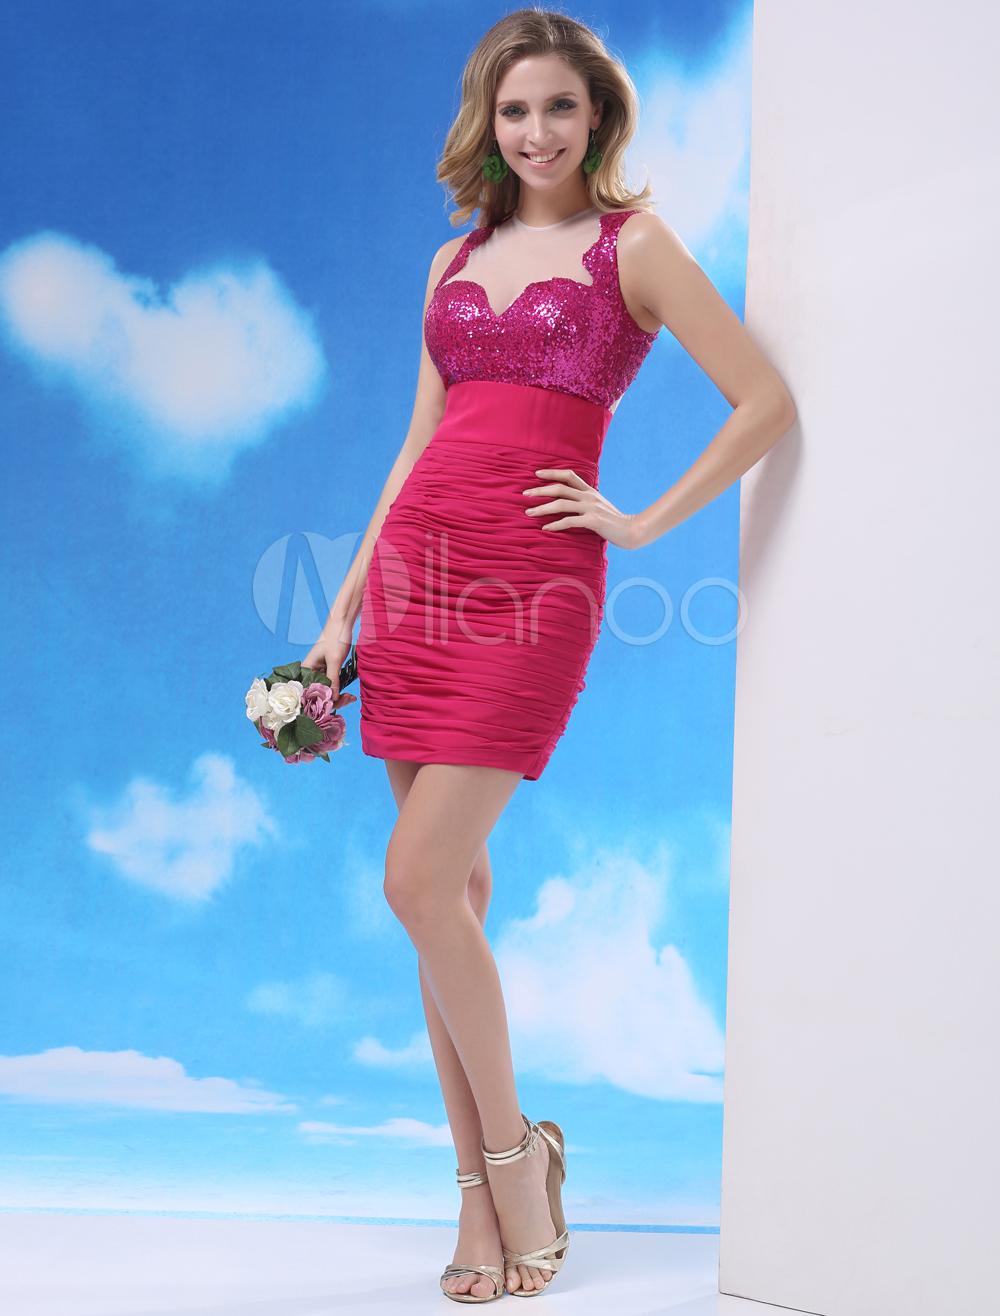 Chiffon Cocktail Dress Sequin Illusion Sheath Prom Dress Hot Pink Jewel Neck Sleeveless Ruched Party Dress Milanoo (Wedding Cocktail Dresses) photo